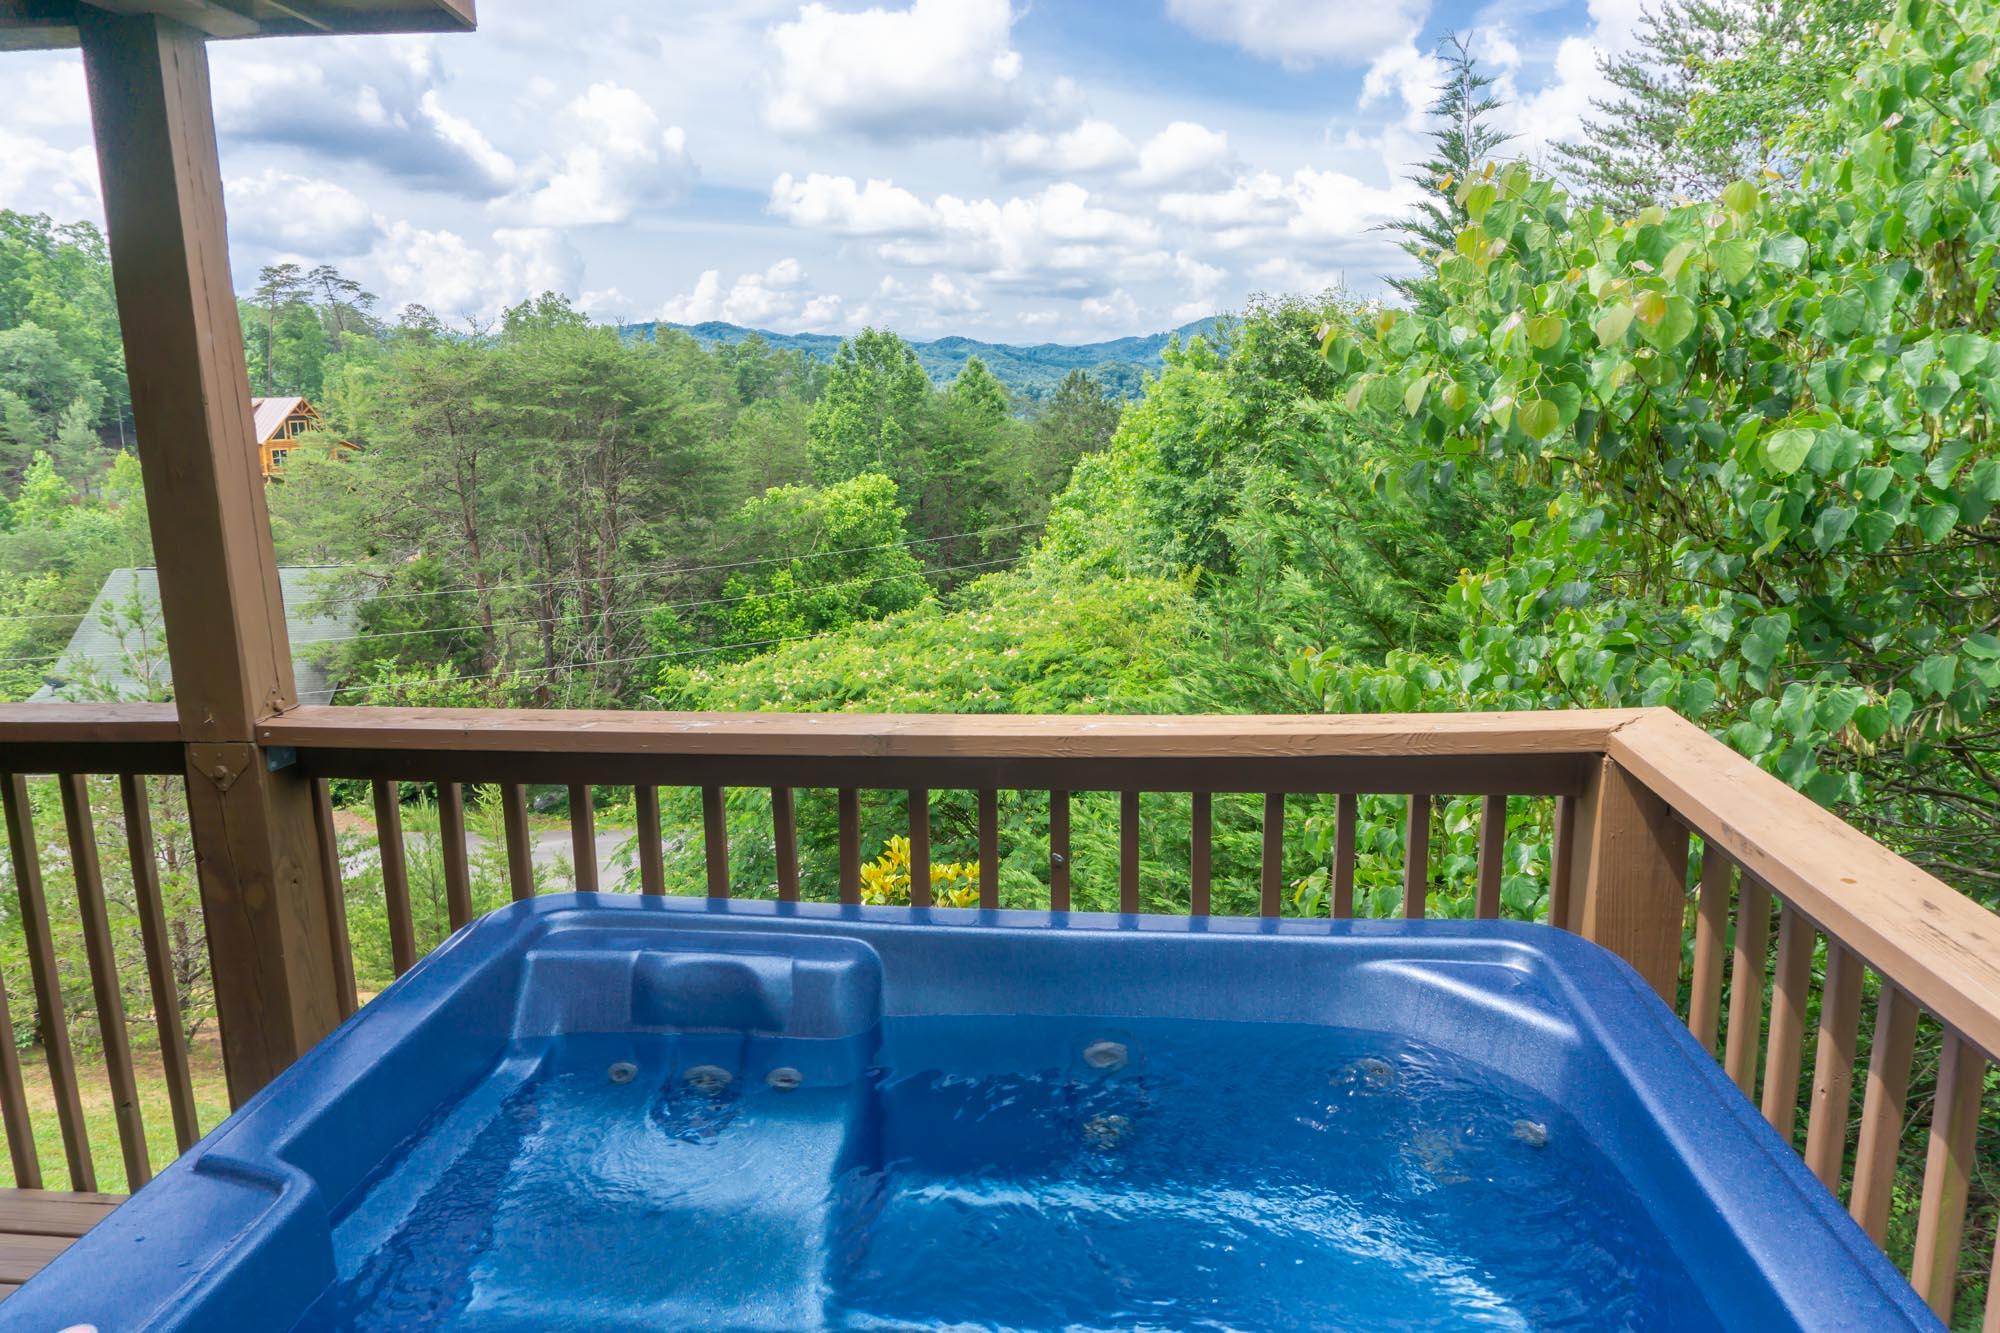 Smoky-Mountain-Splendor-hot-tub-view